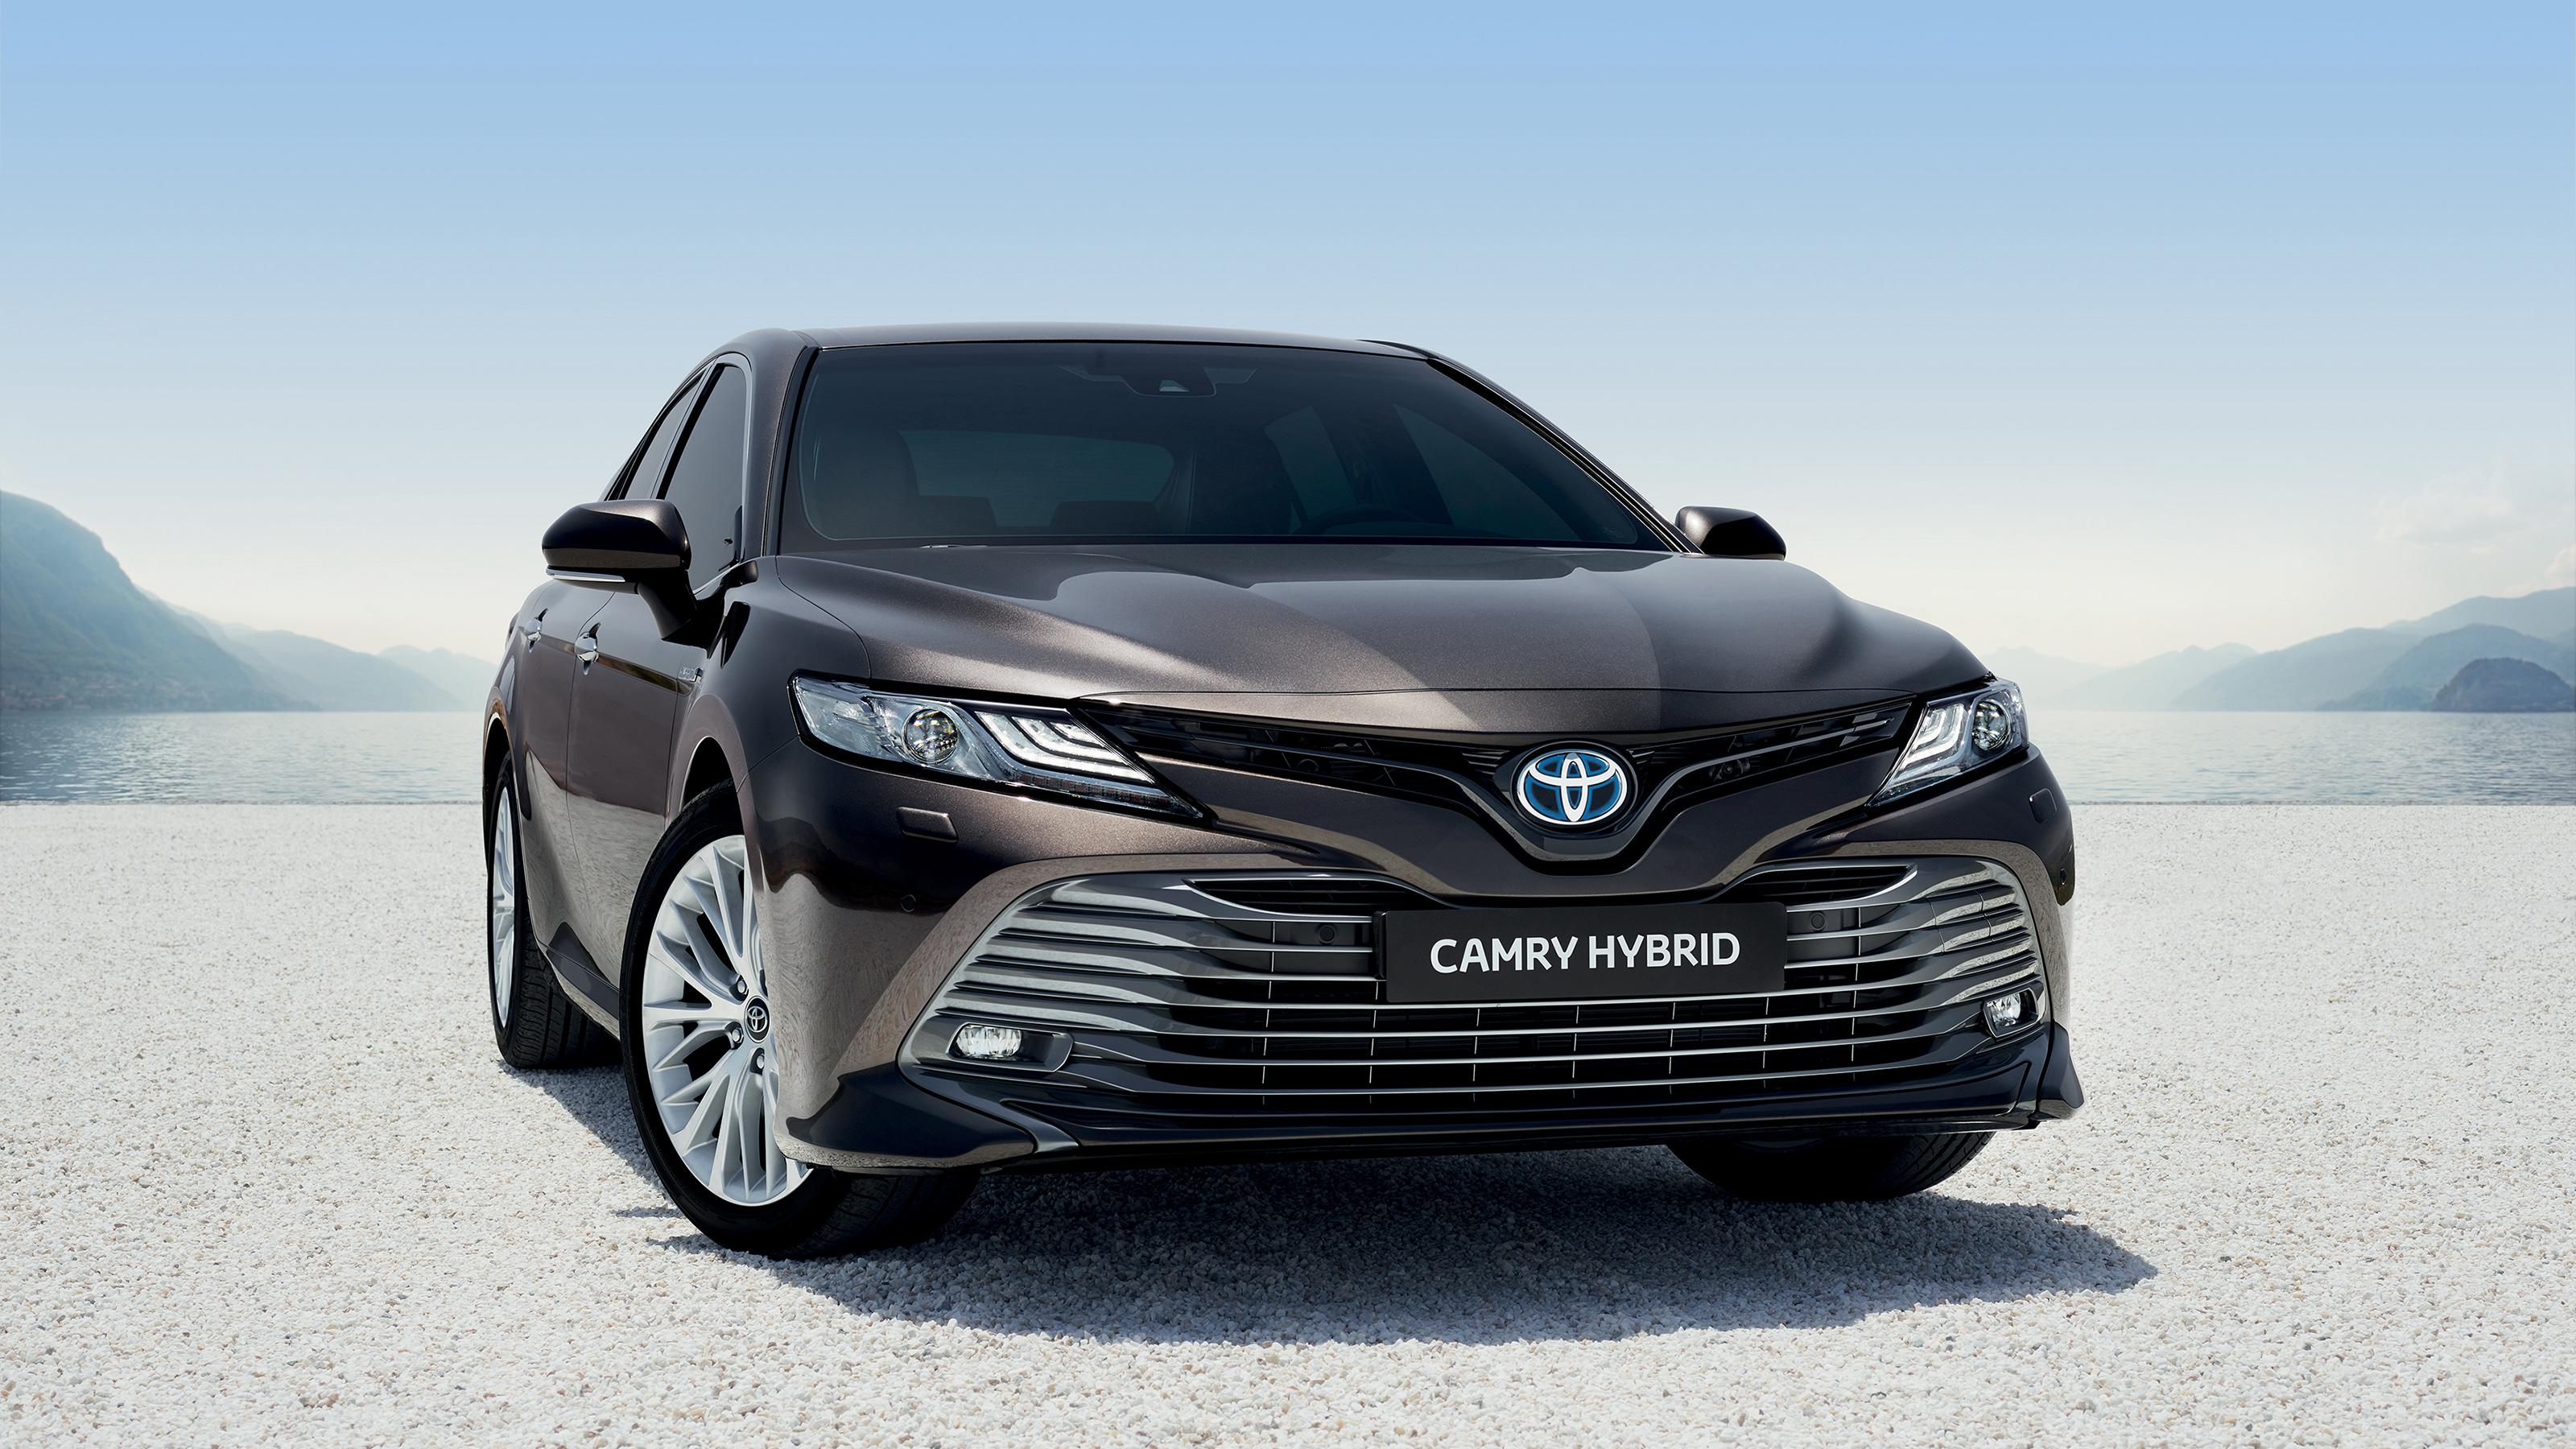 Toyota Camry Hybrid 2019 Wallpaper HD Car Wallpapers ID 11213 3200x1800